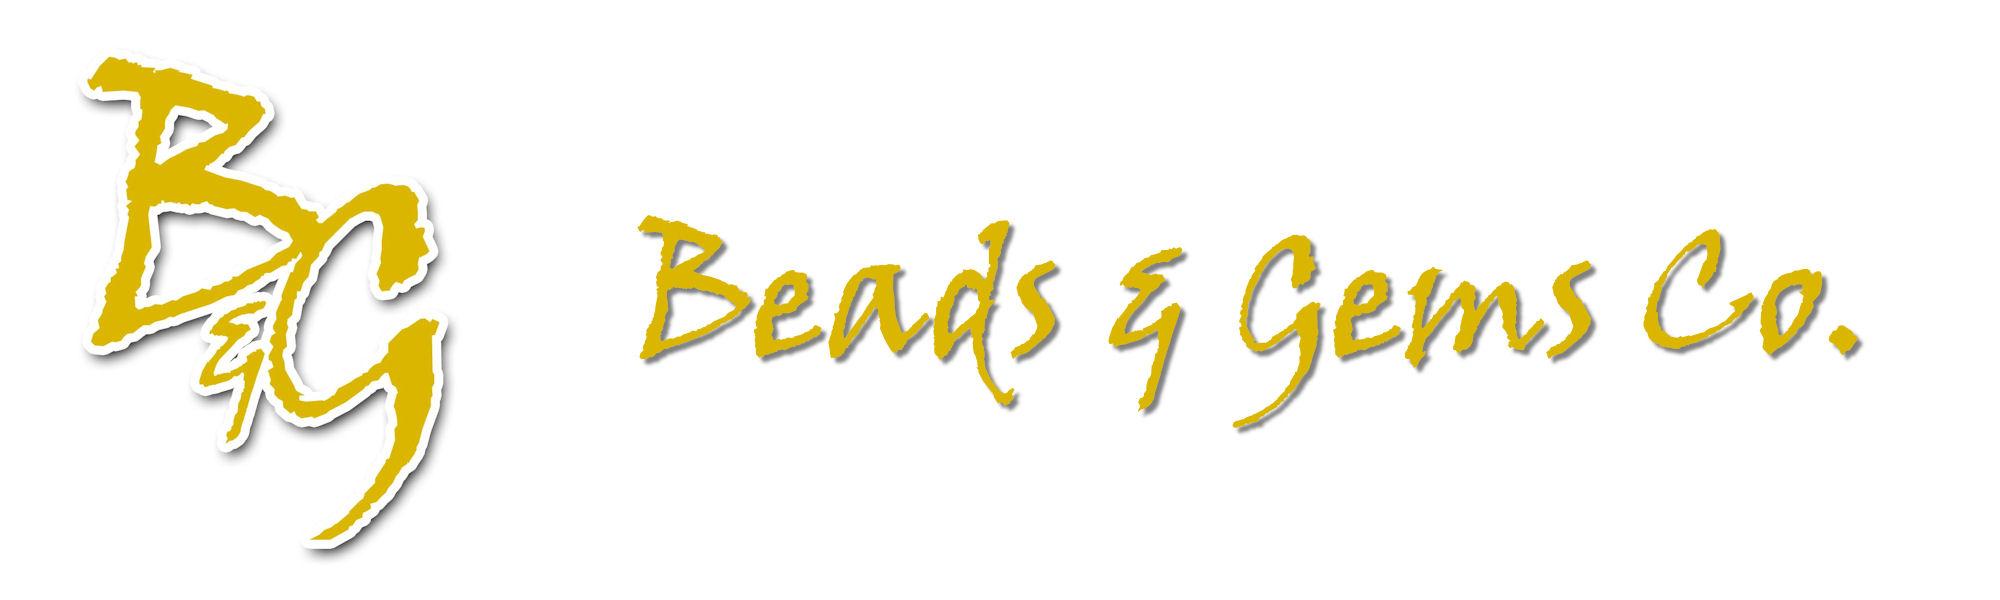 Beads & Gems Co.